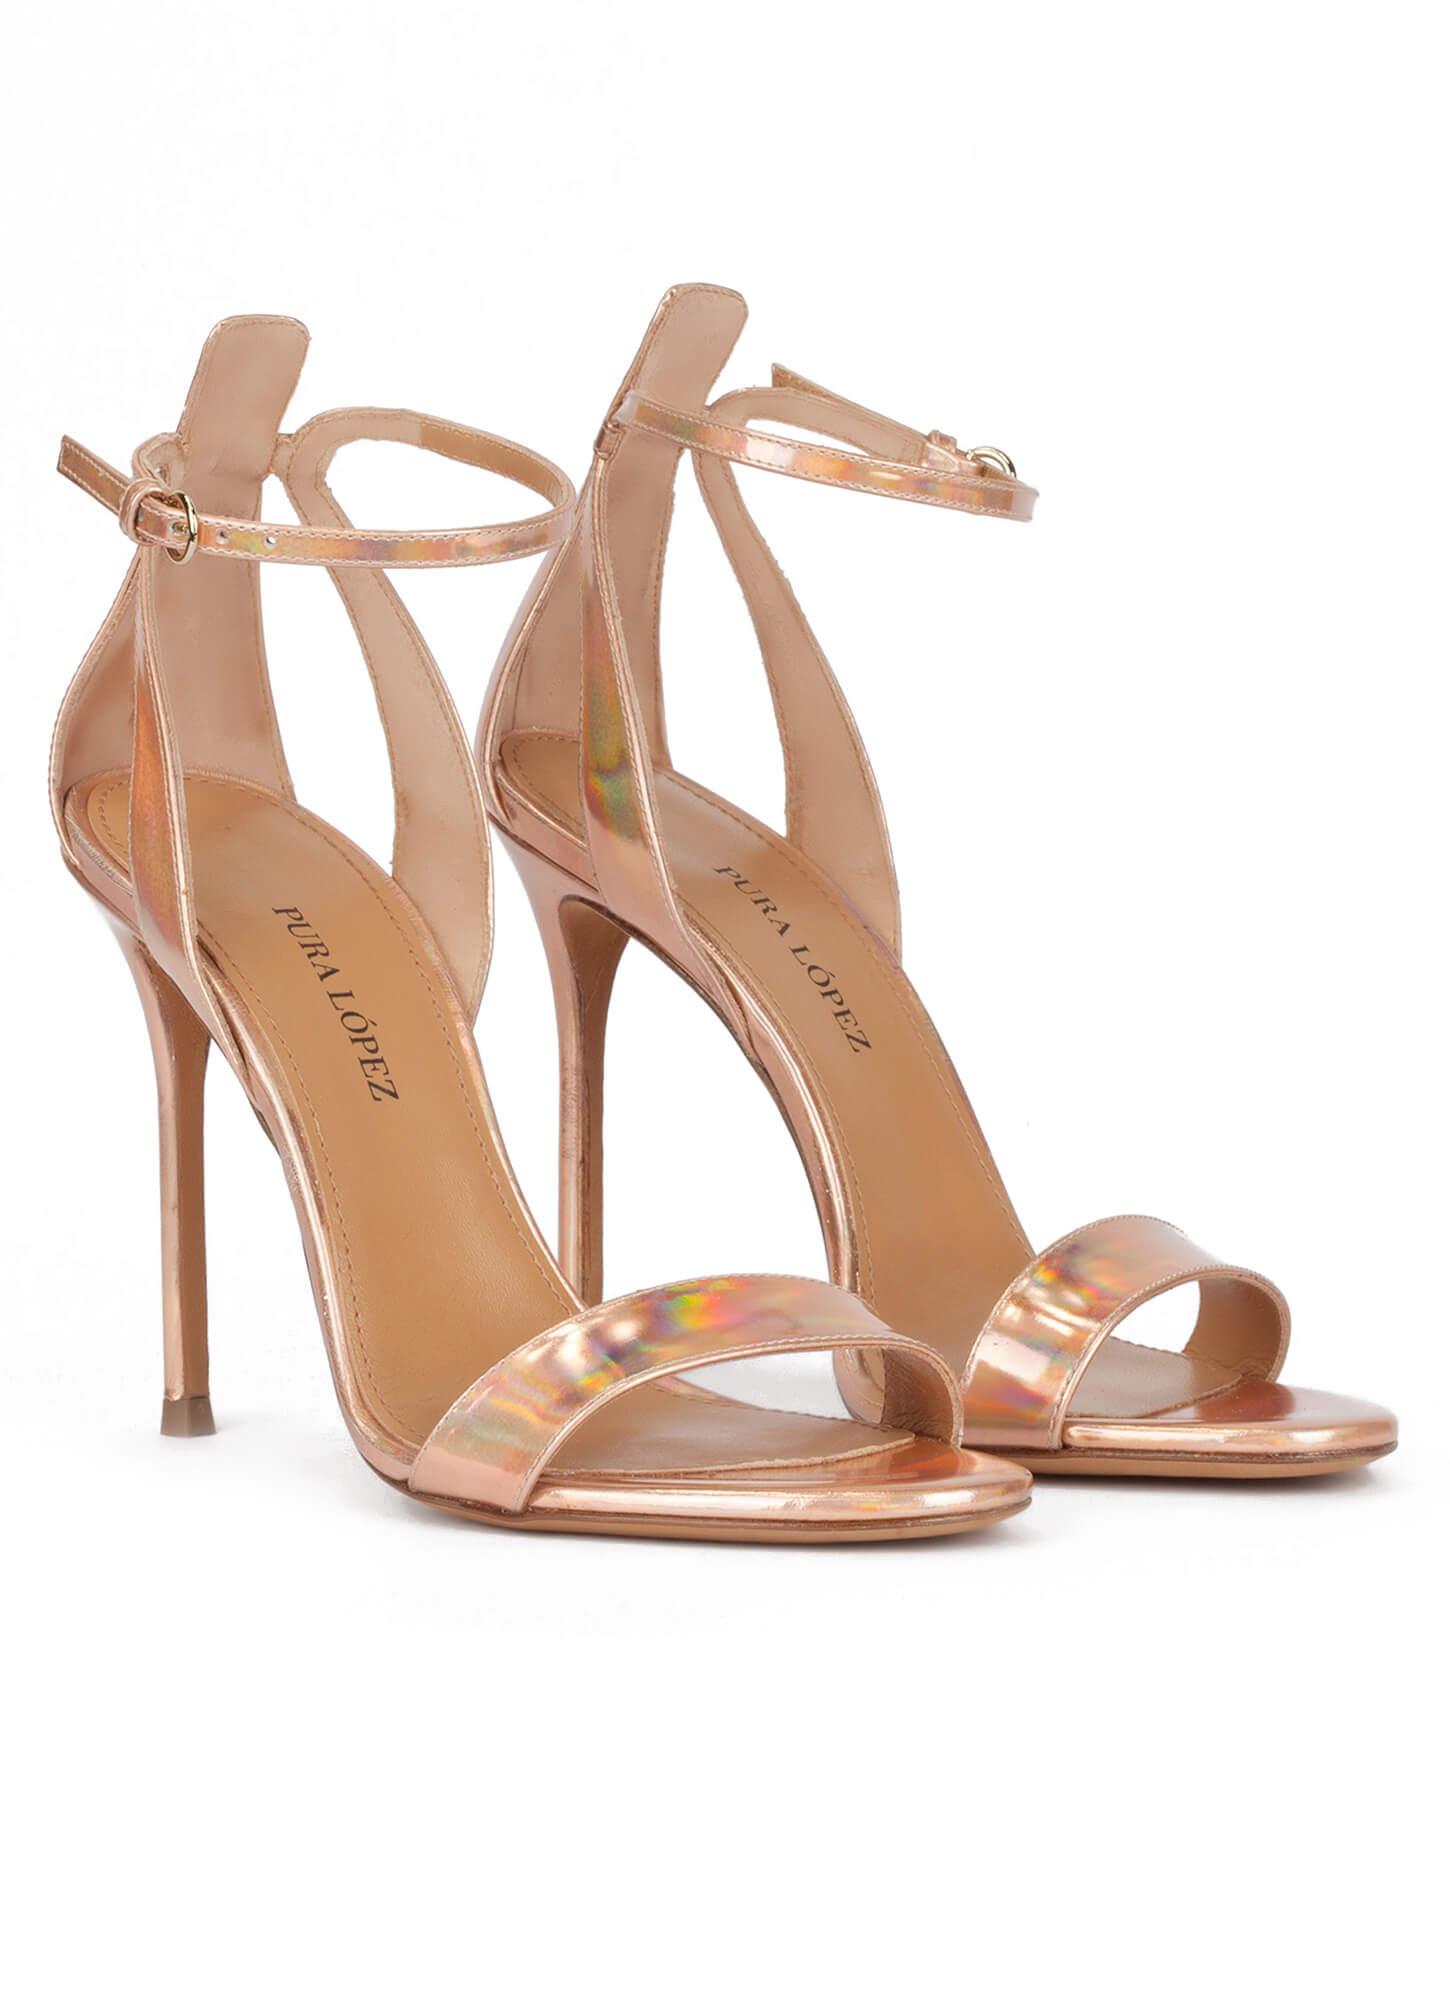 751c3c7a0f Martina Pura López. Party high heel sandals in nude metallic leather Party high  heel sandals in nude metallic leather ...